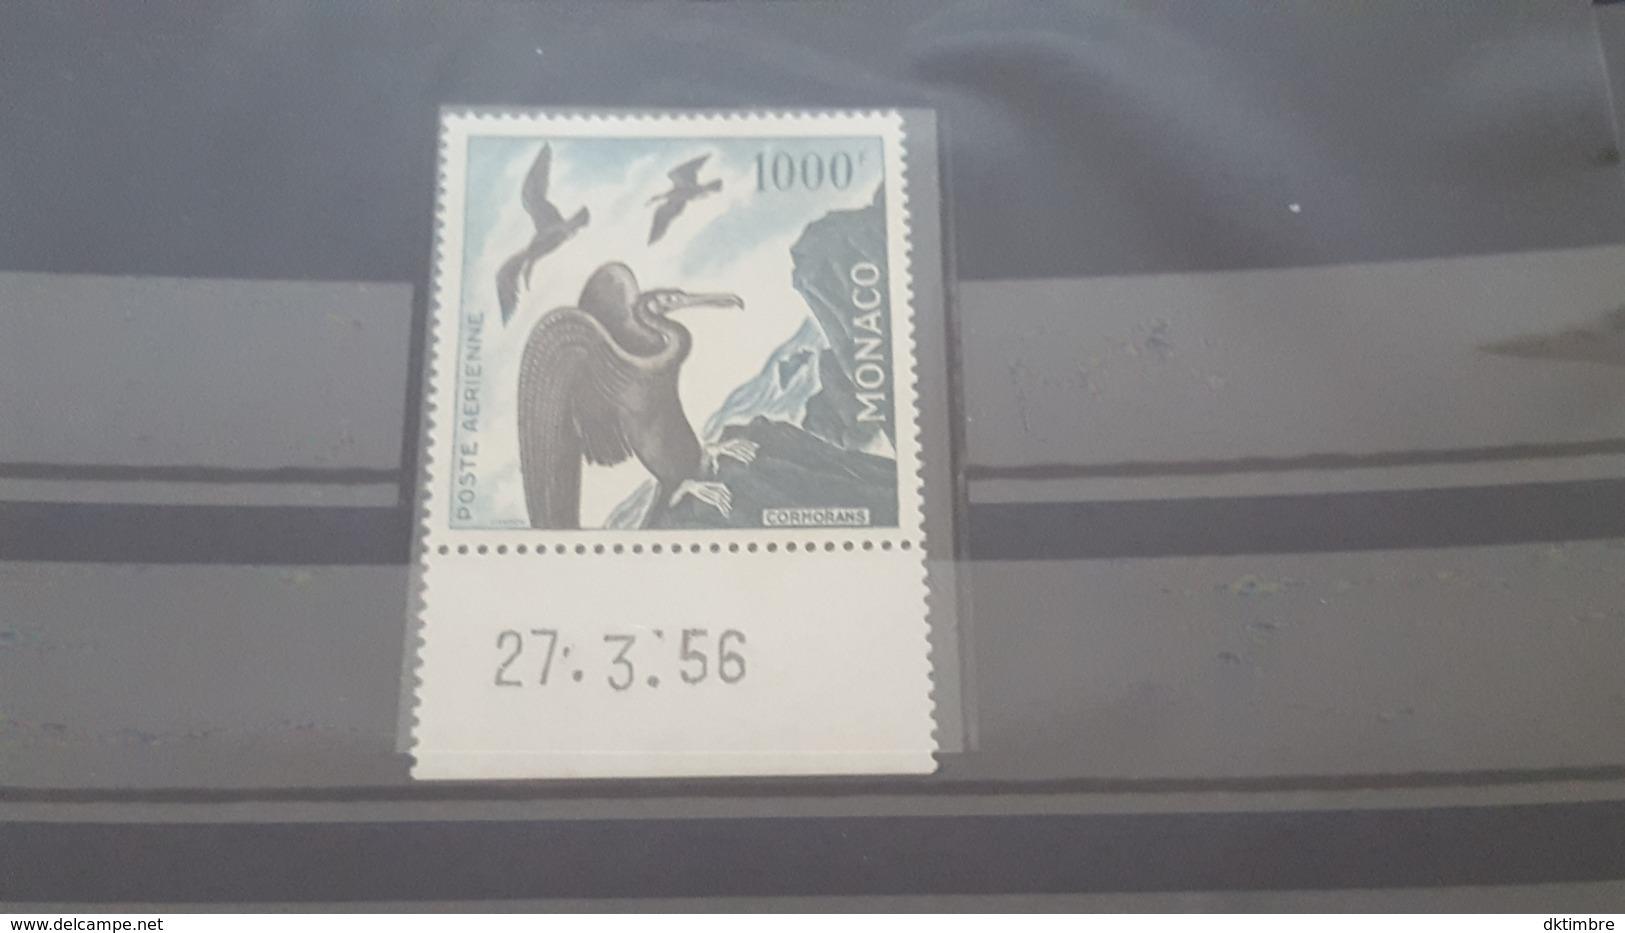 LOT 460856 TIMBRE DE MONACO NEUF** LUXE N°68 - Airmail